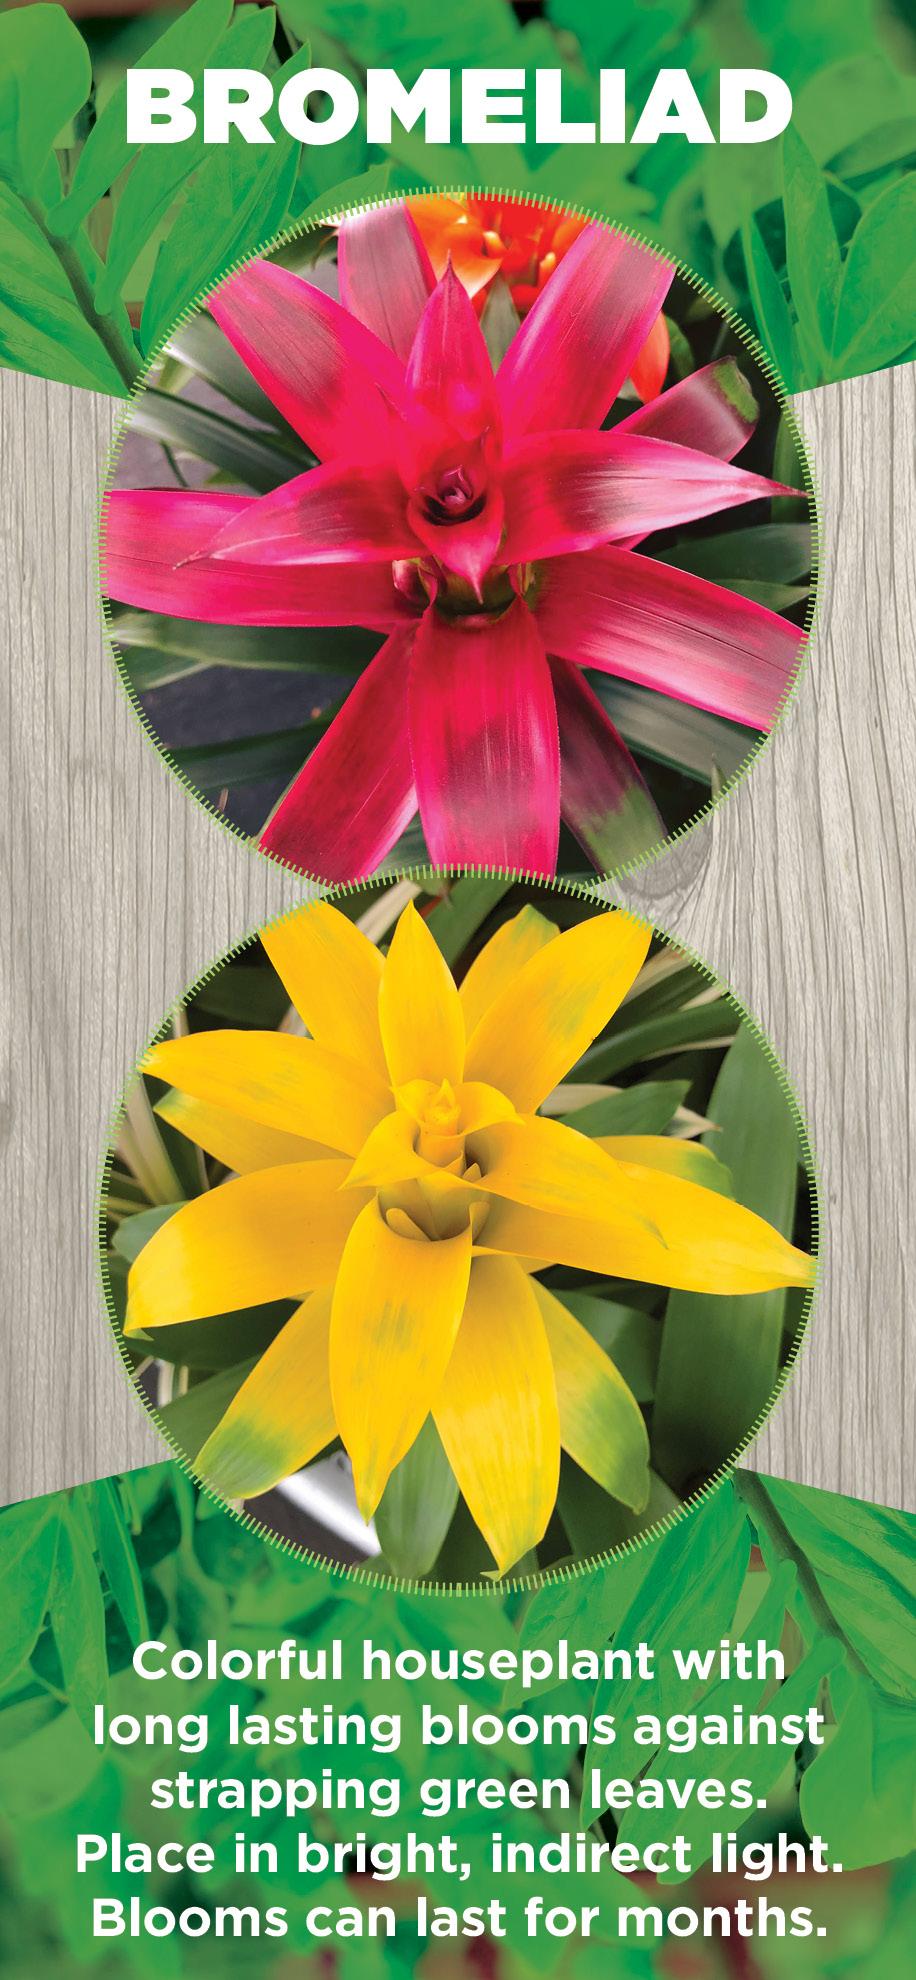 Bromeliad | TLC Garden Centers